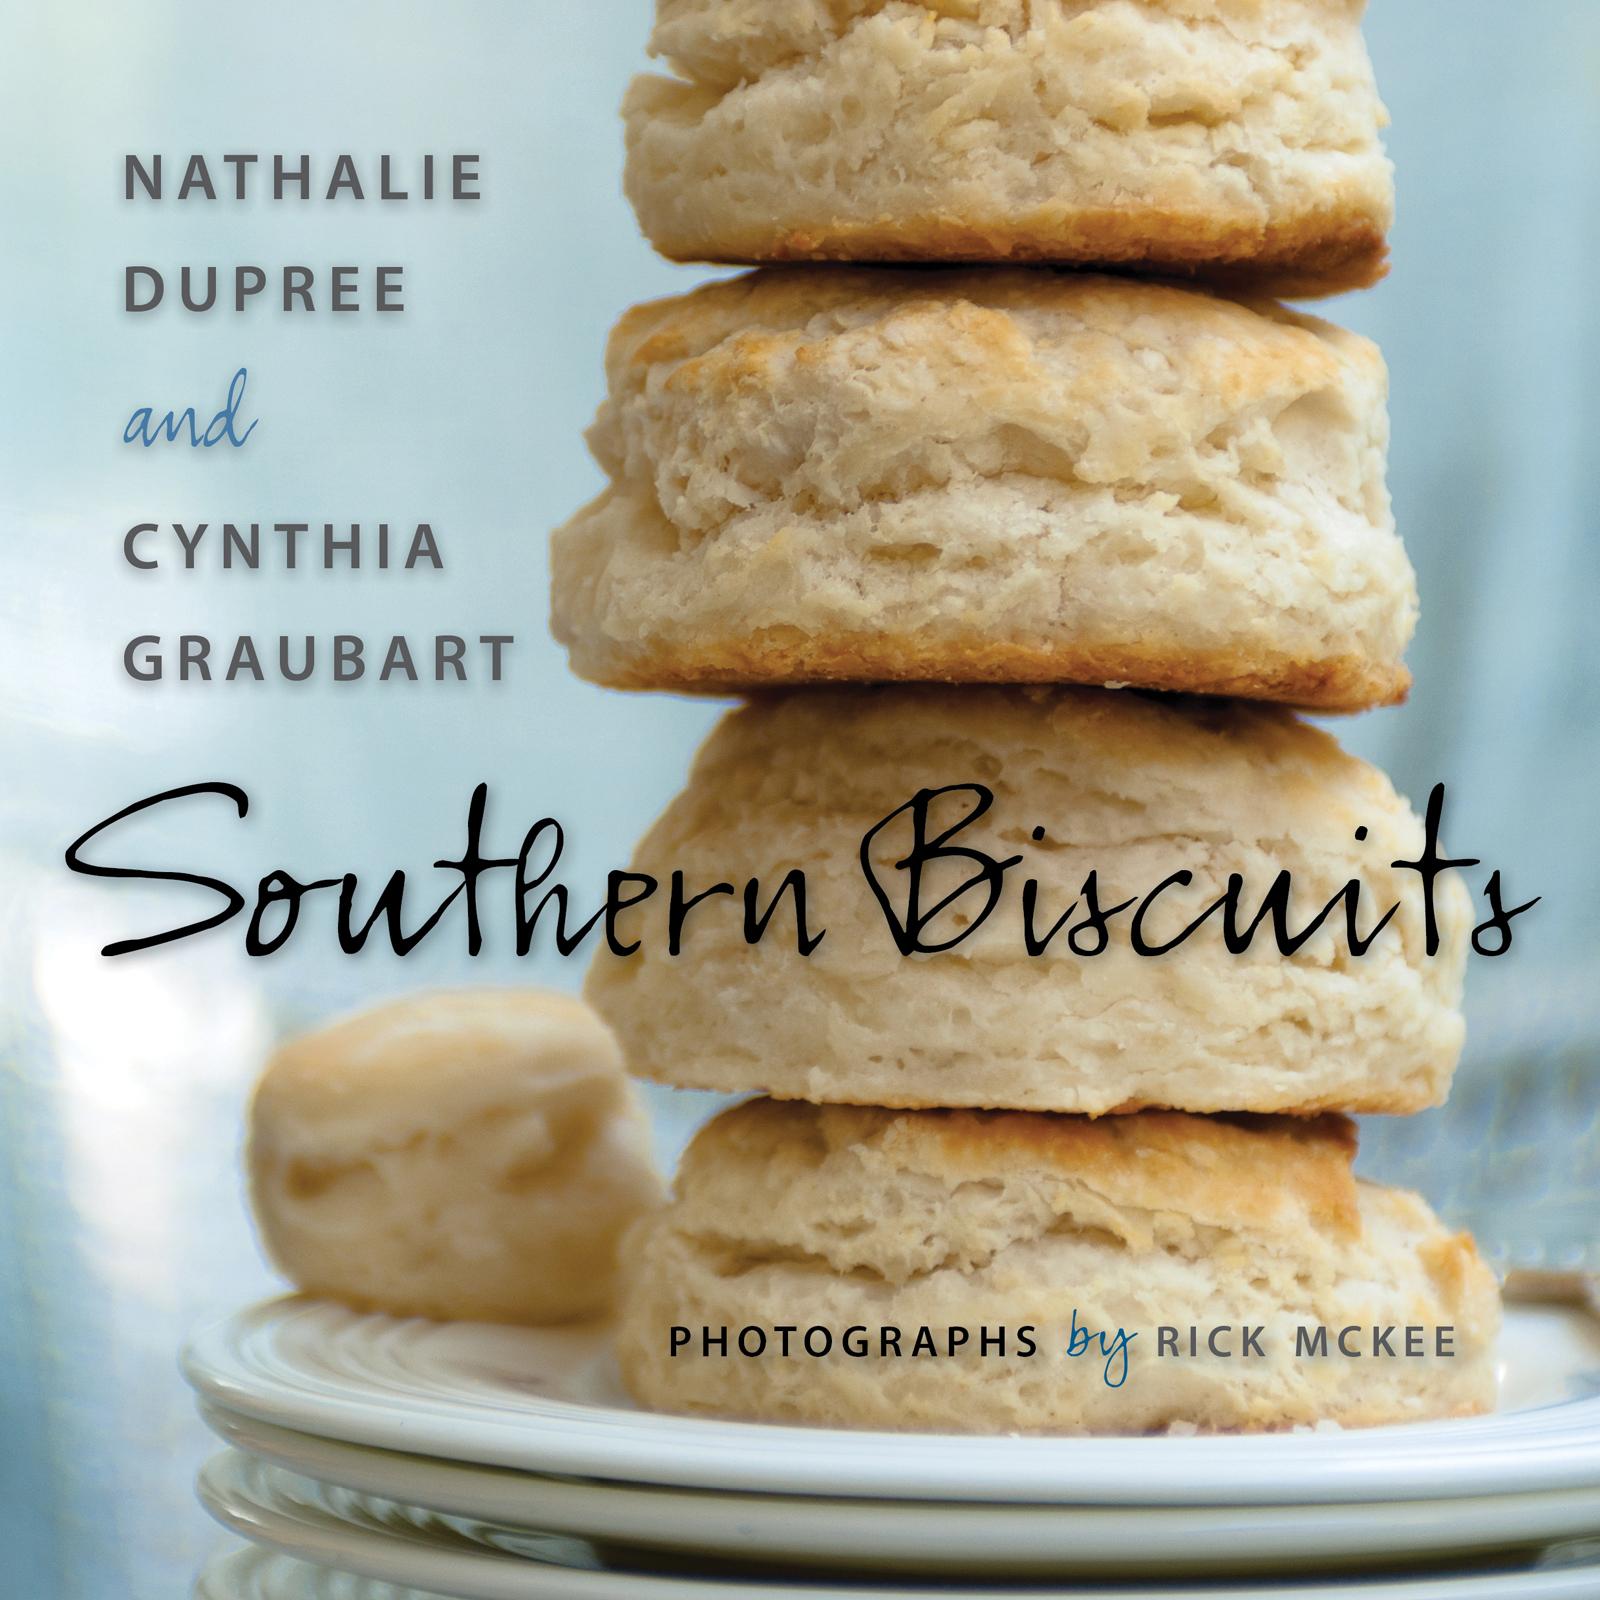 Southern Biscuits Nathalie Dupree cynthia Graubart